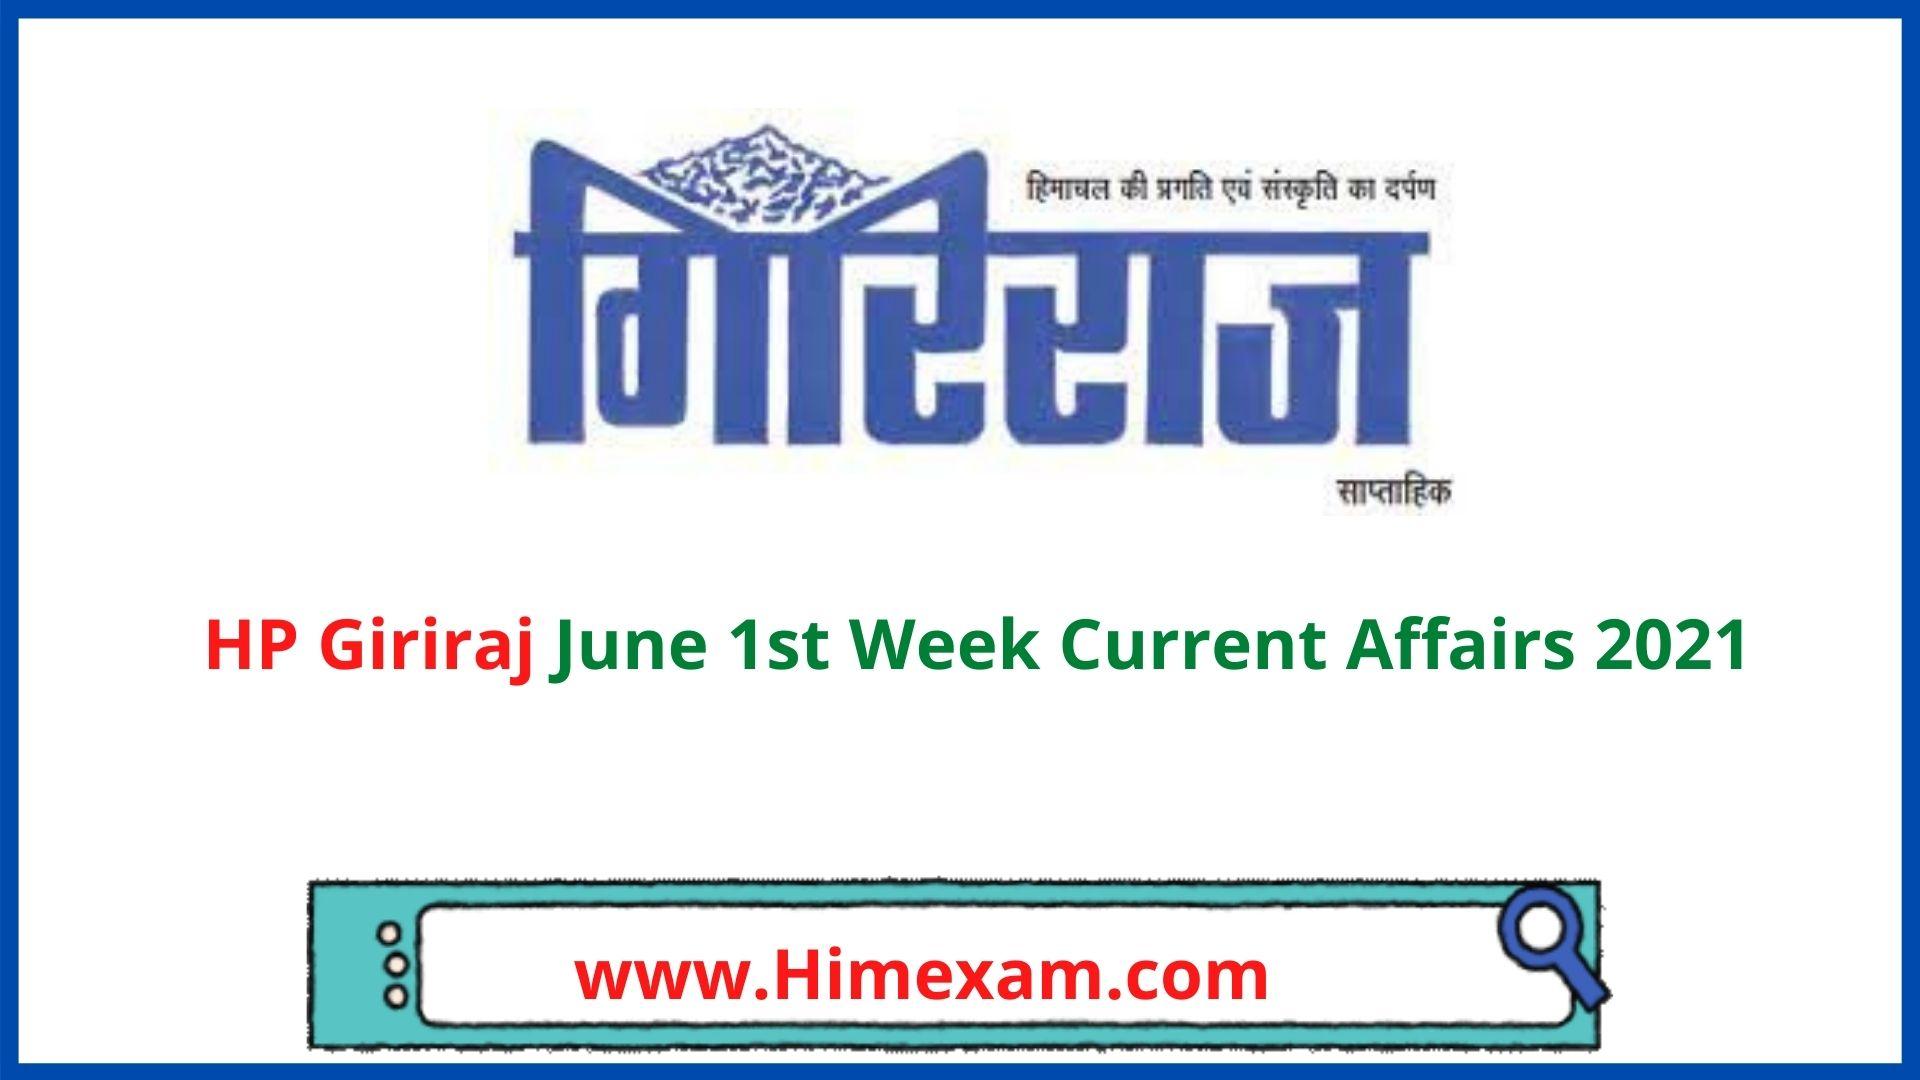 HP Giriraj June 1st Week Current Affairs 2021